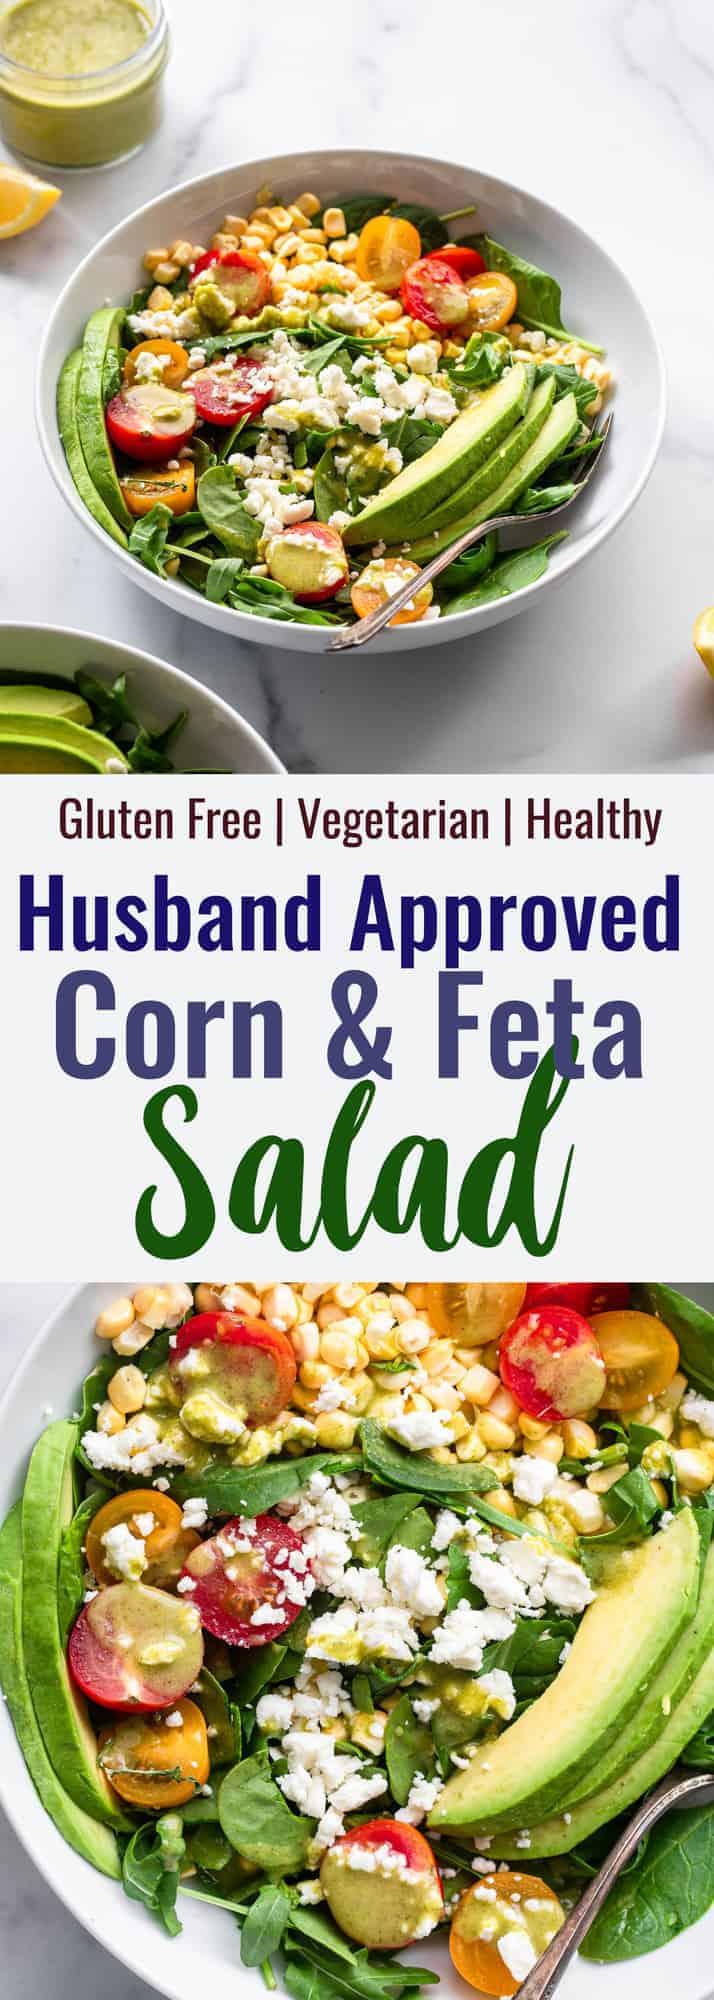 corn feta salad collage photo